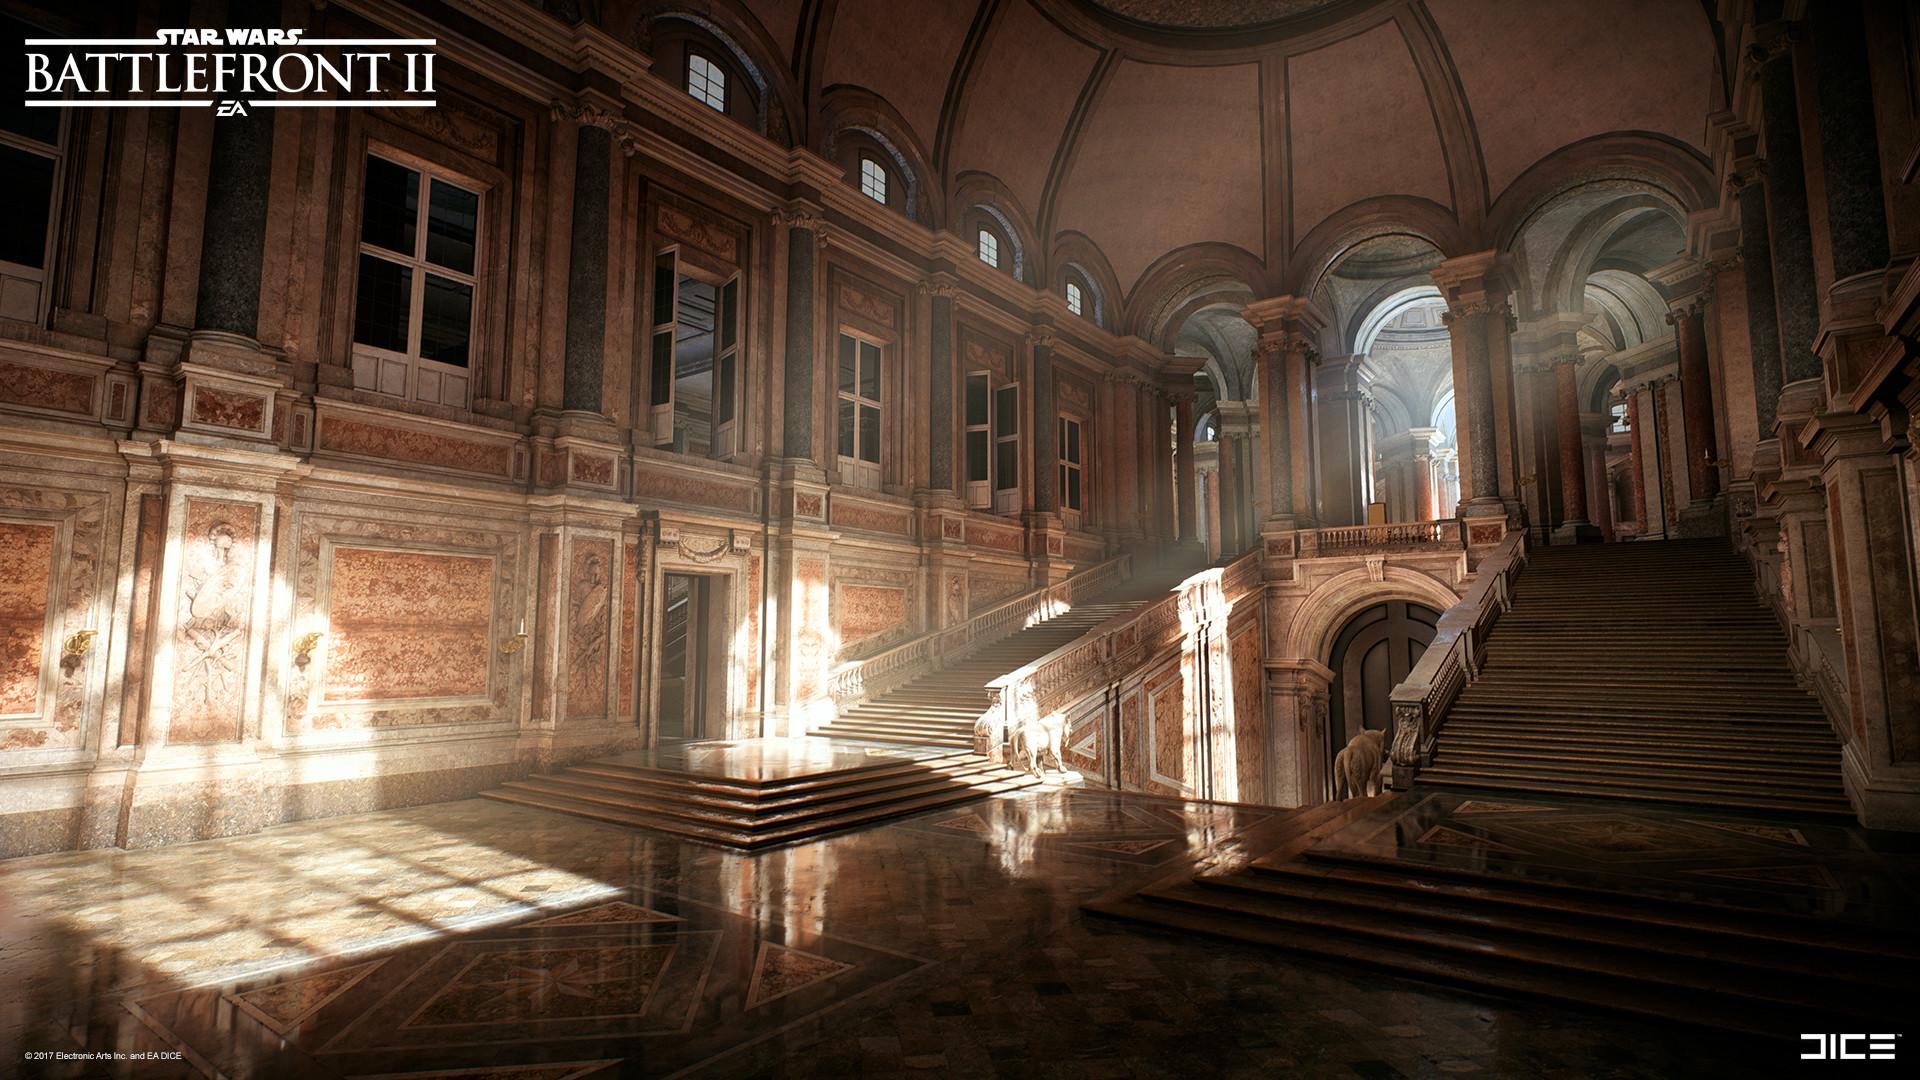 Pontus Ryman Star Wars Battlefront Ii Theed City Throne Room